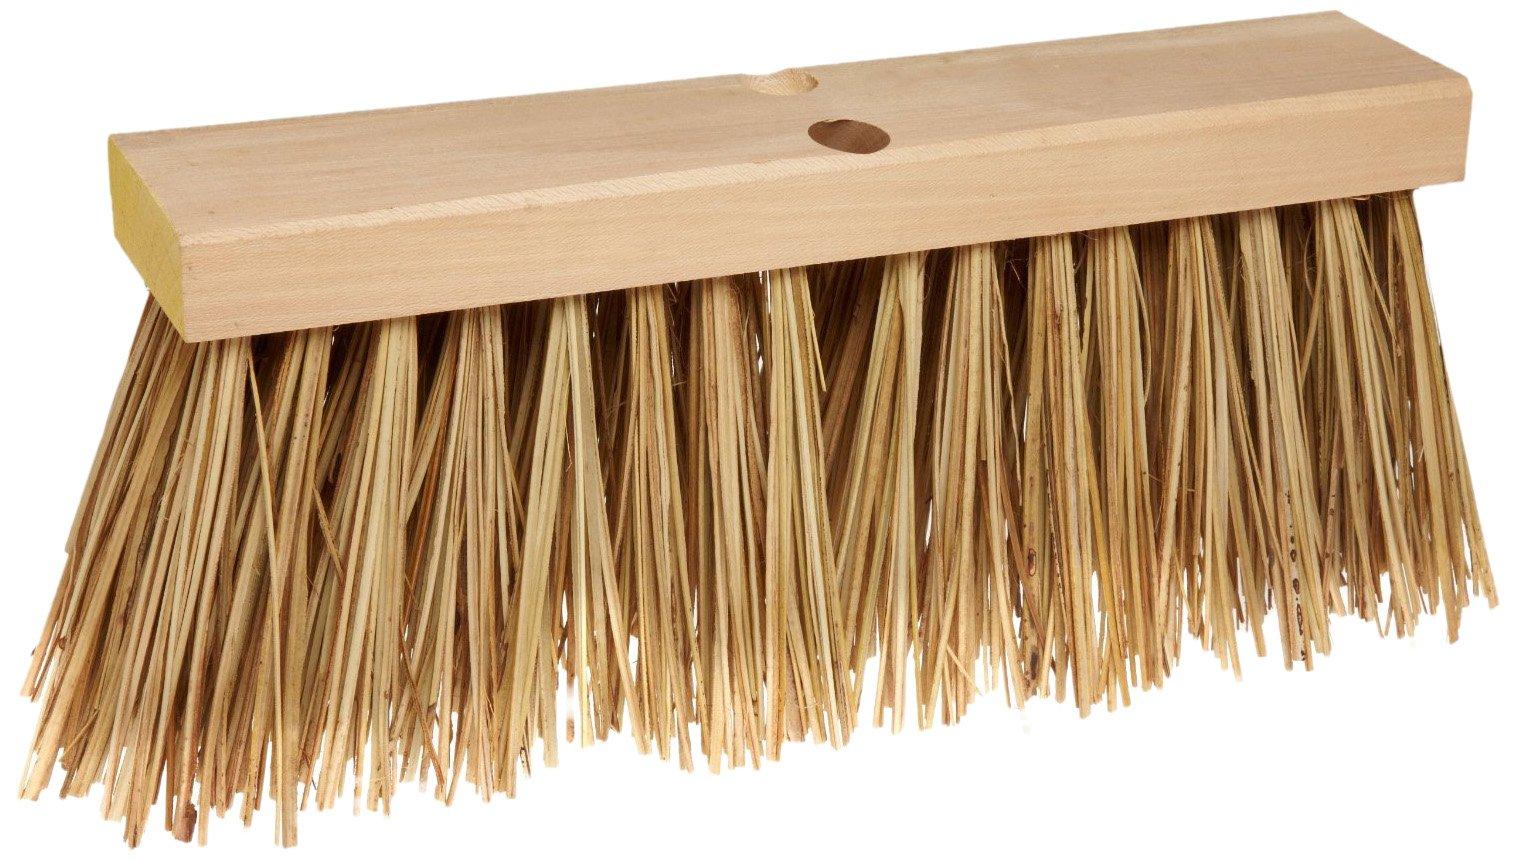 Rubbermaid Commercial  Street Broom Head, Palmyra, 16'', FG9B2200BRN by Rubbermaid Commercial Products